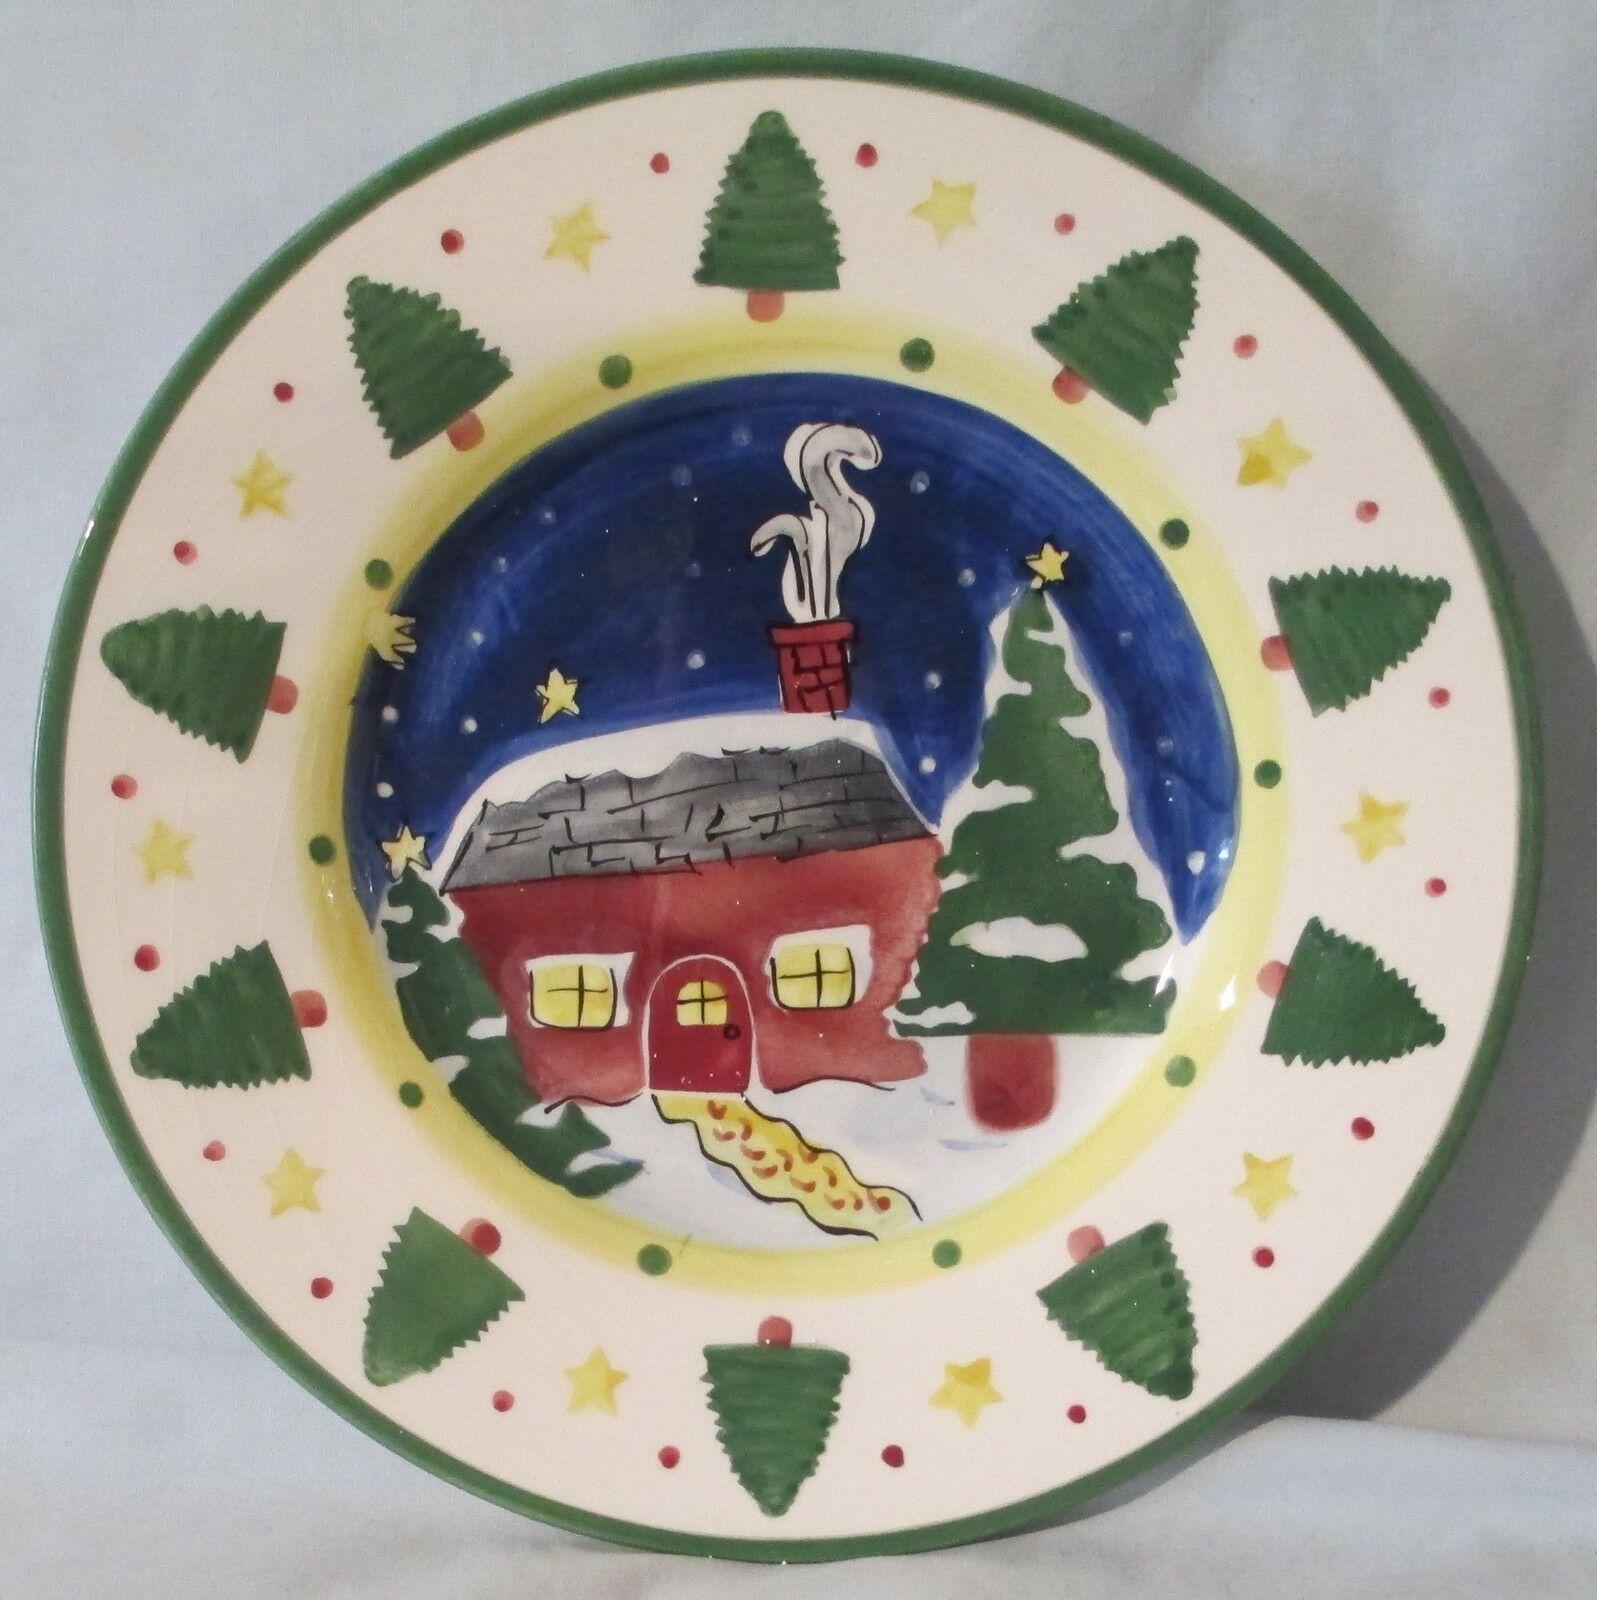 Insprado IDC Christmas Cabin Salad Plate set of 4 image 2